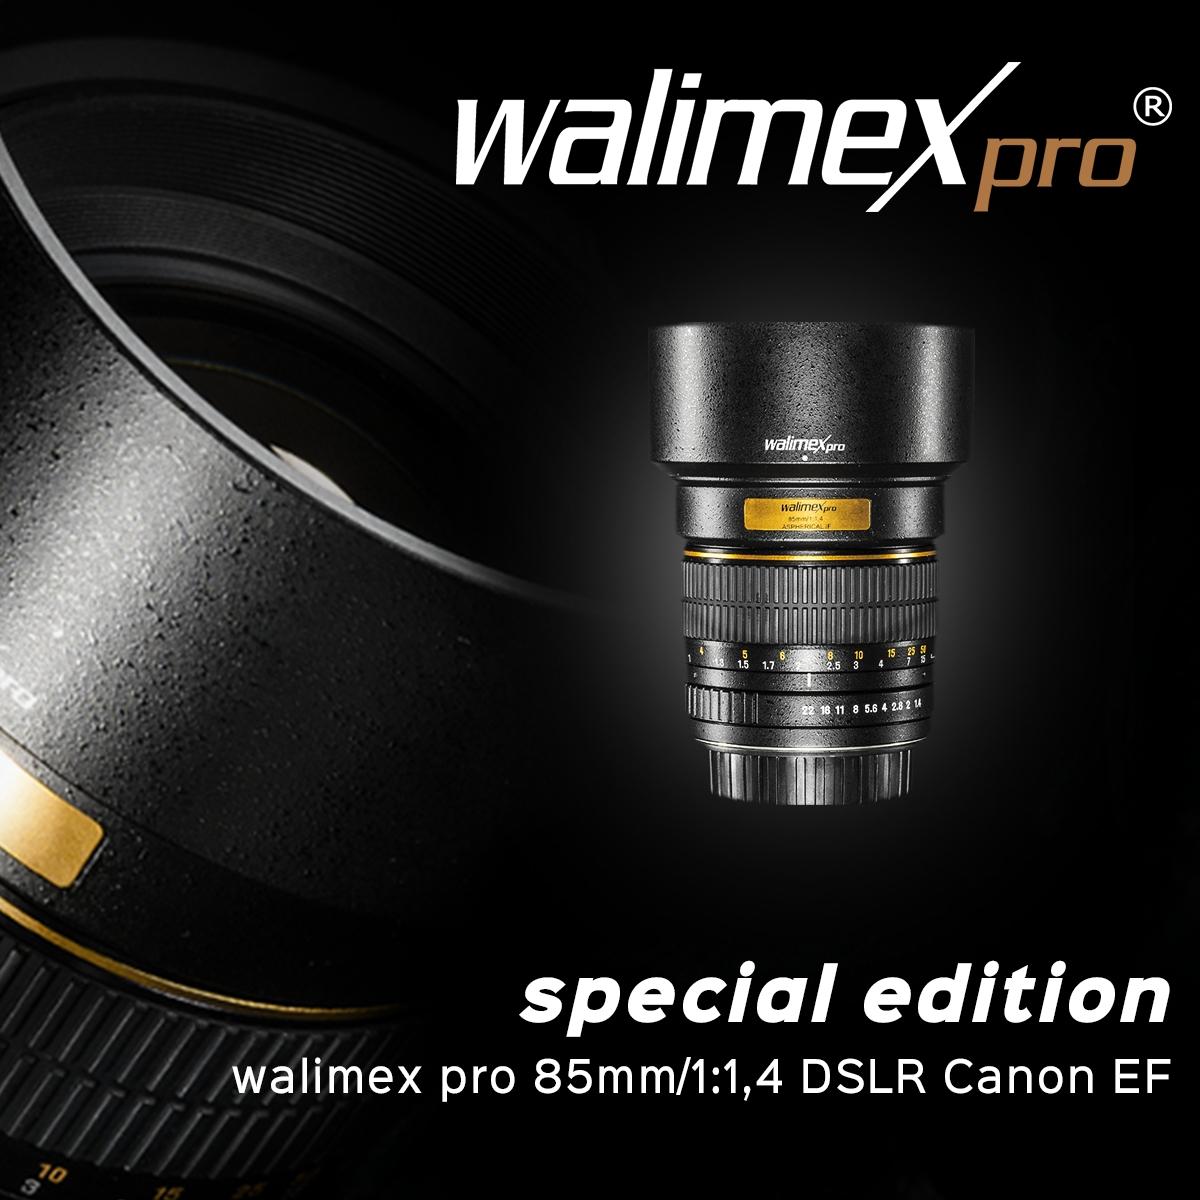 walimex pro 85/1,4  DSLR Canon EF - 30% reduziert